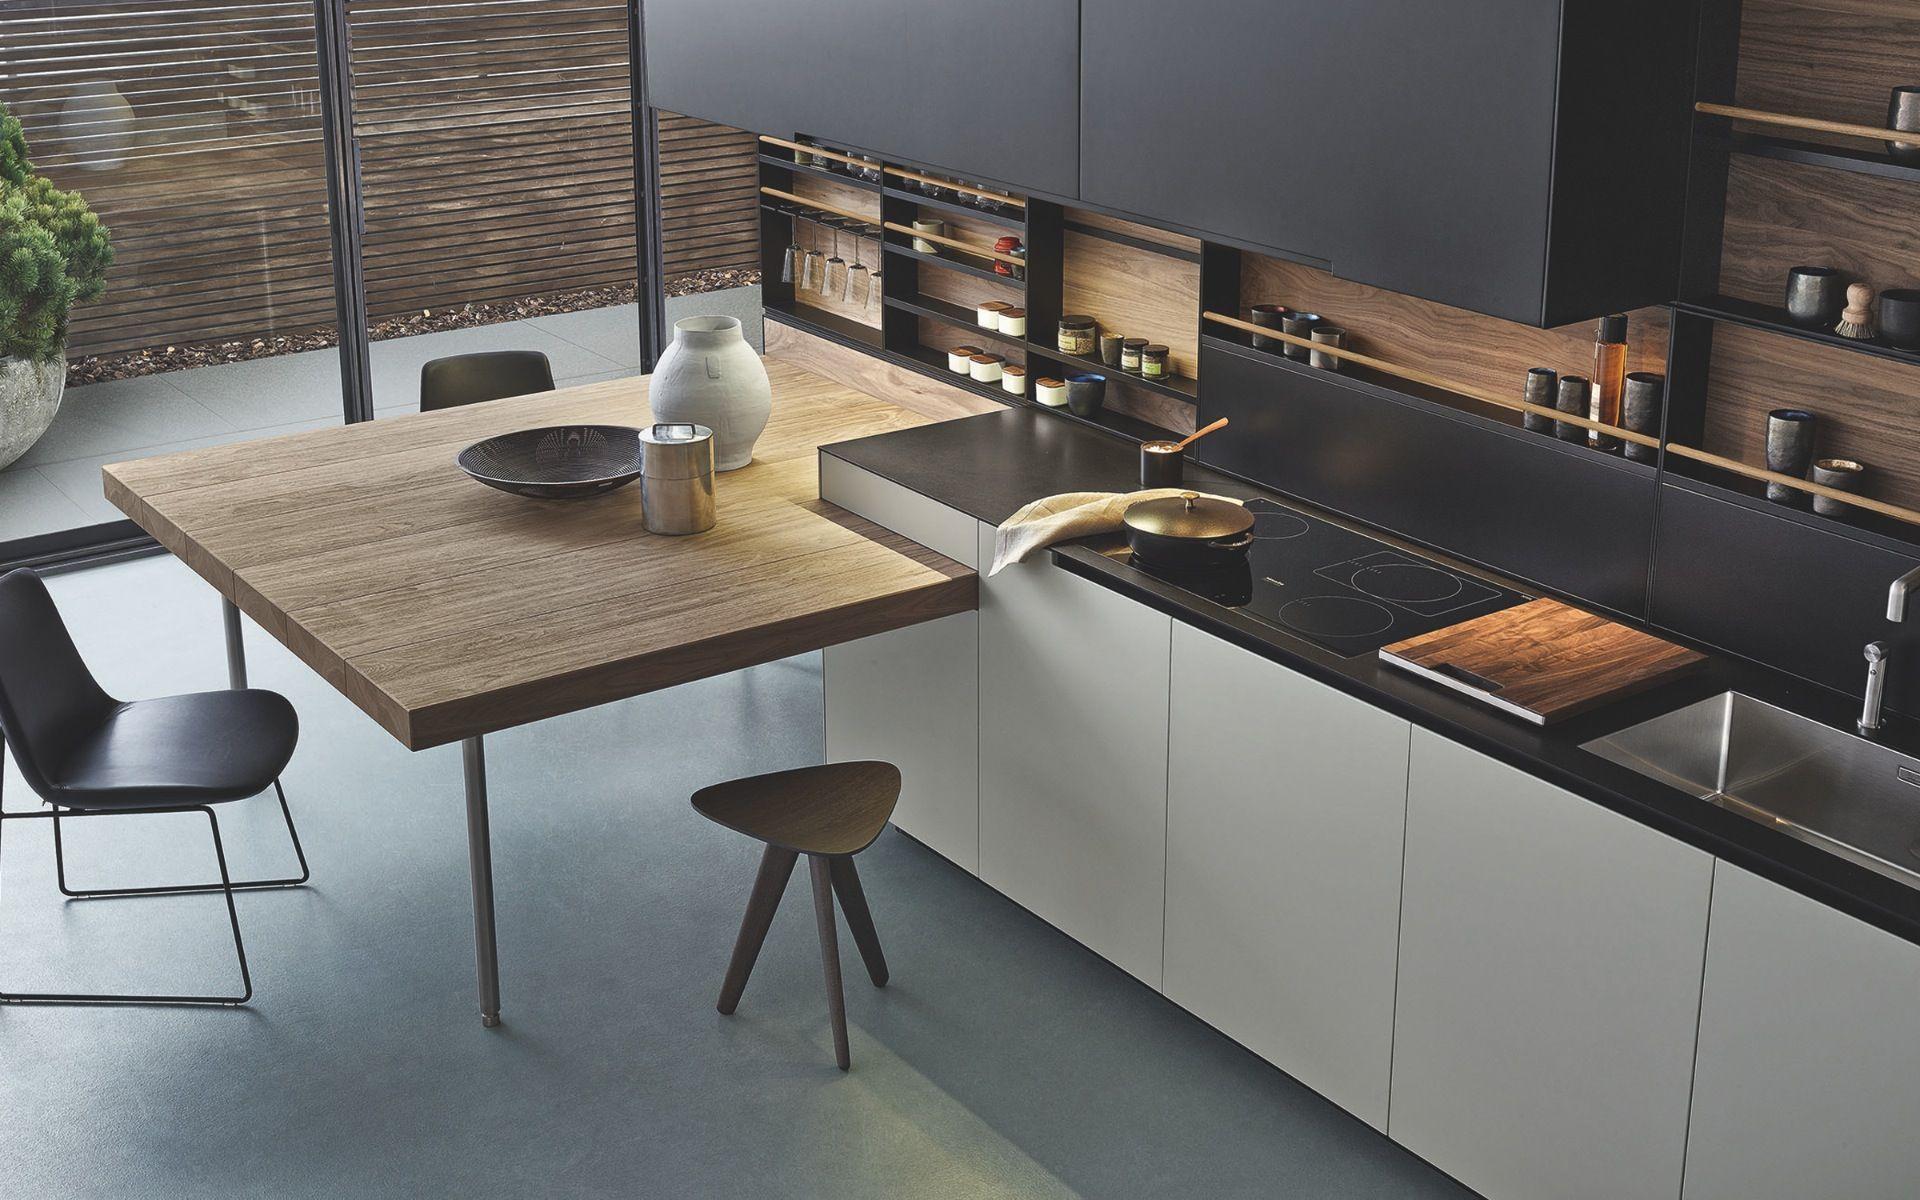 Bagno Sasso Mobili – Varenna Küchen | keuken | Pinterest | Küche ...